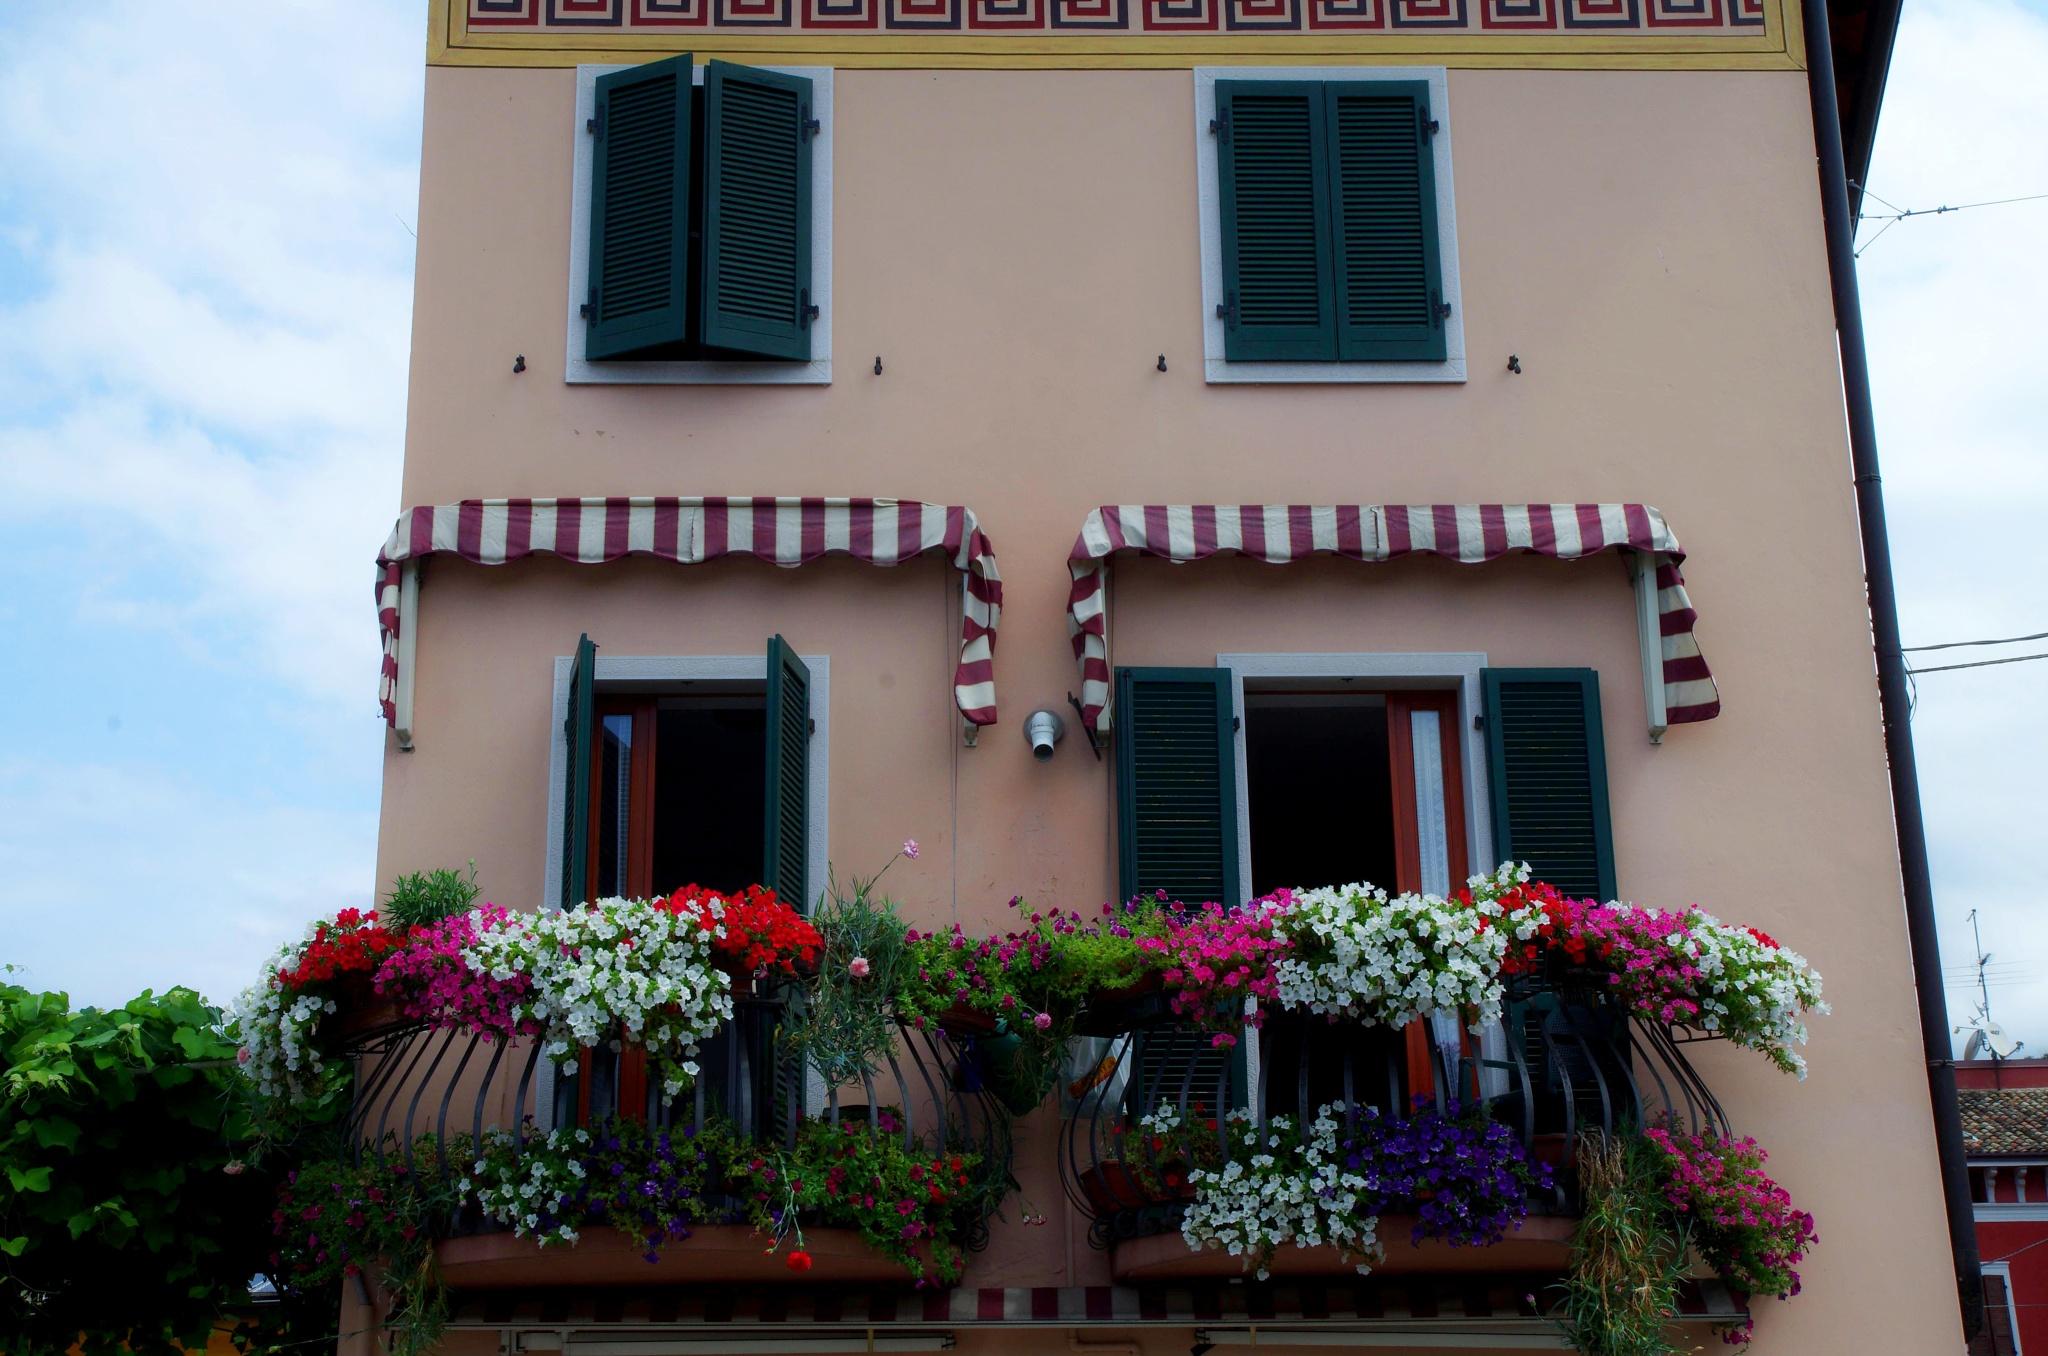 House on Lake Garda/Italy by EdwardStern